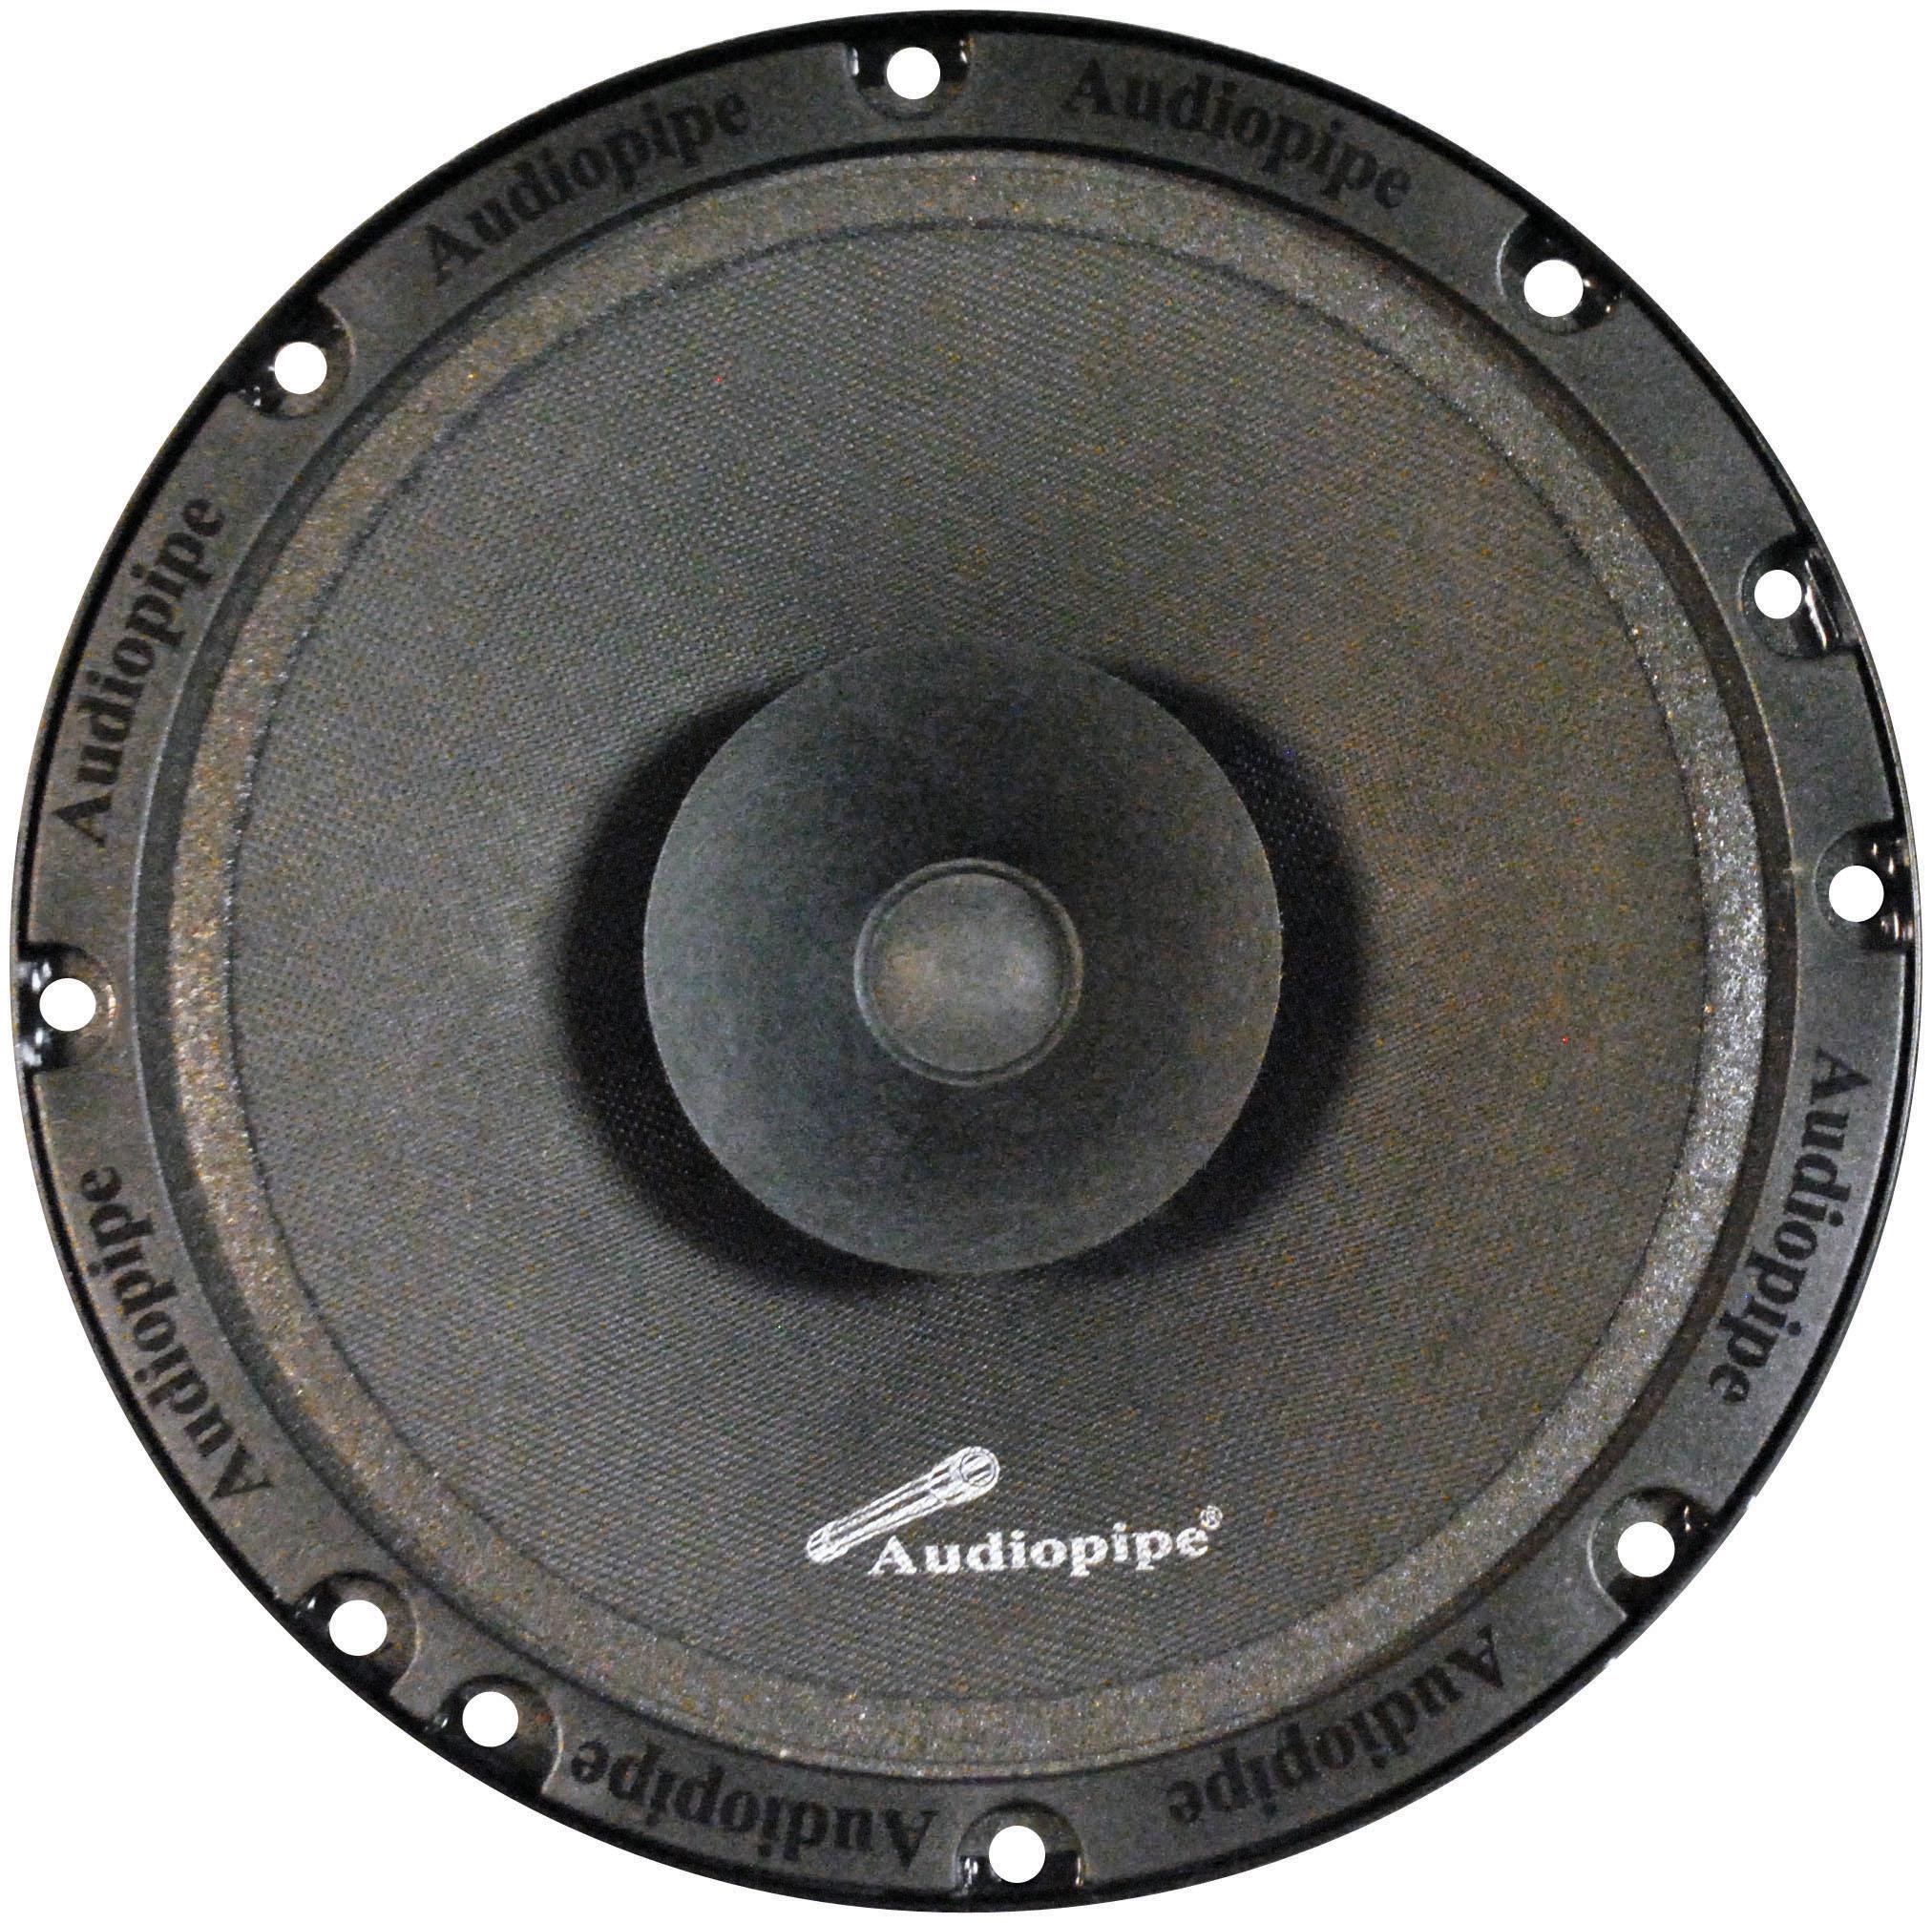 "Audiopipe APMB1611DL 6.5"" Loudspeaker 120w Max Sold In Pairs"